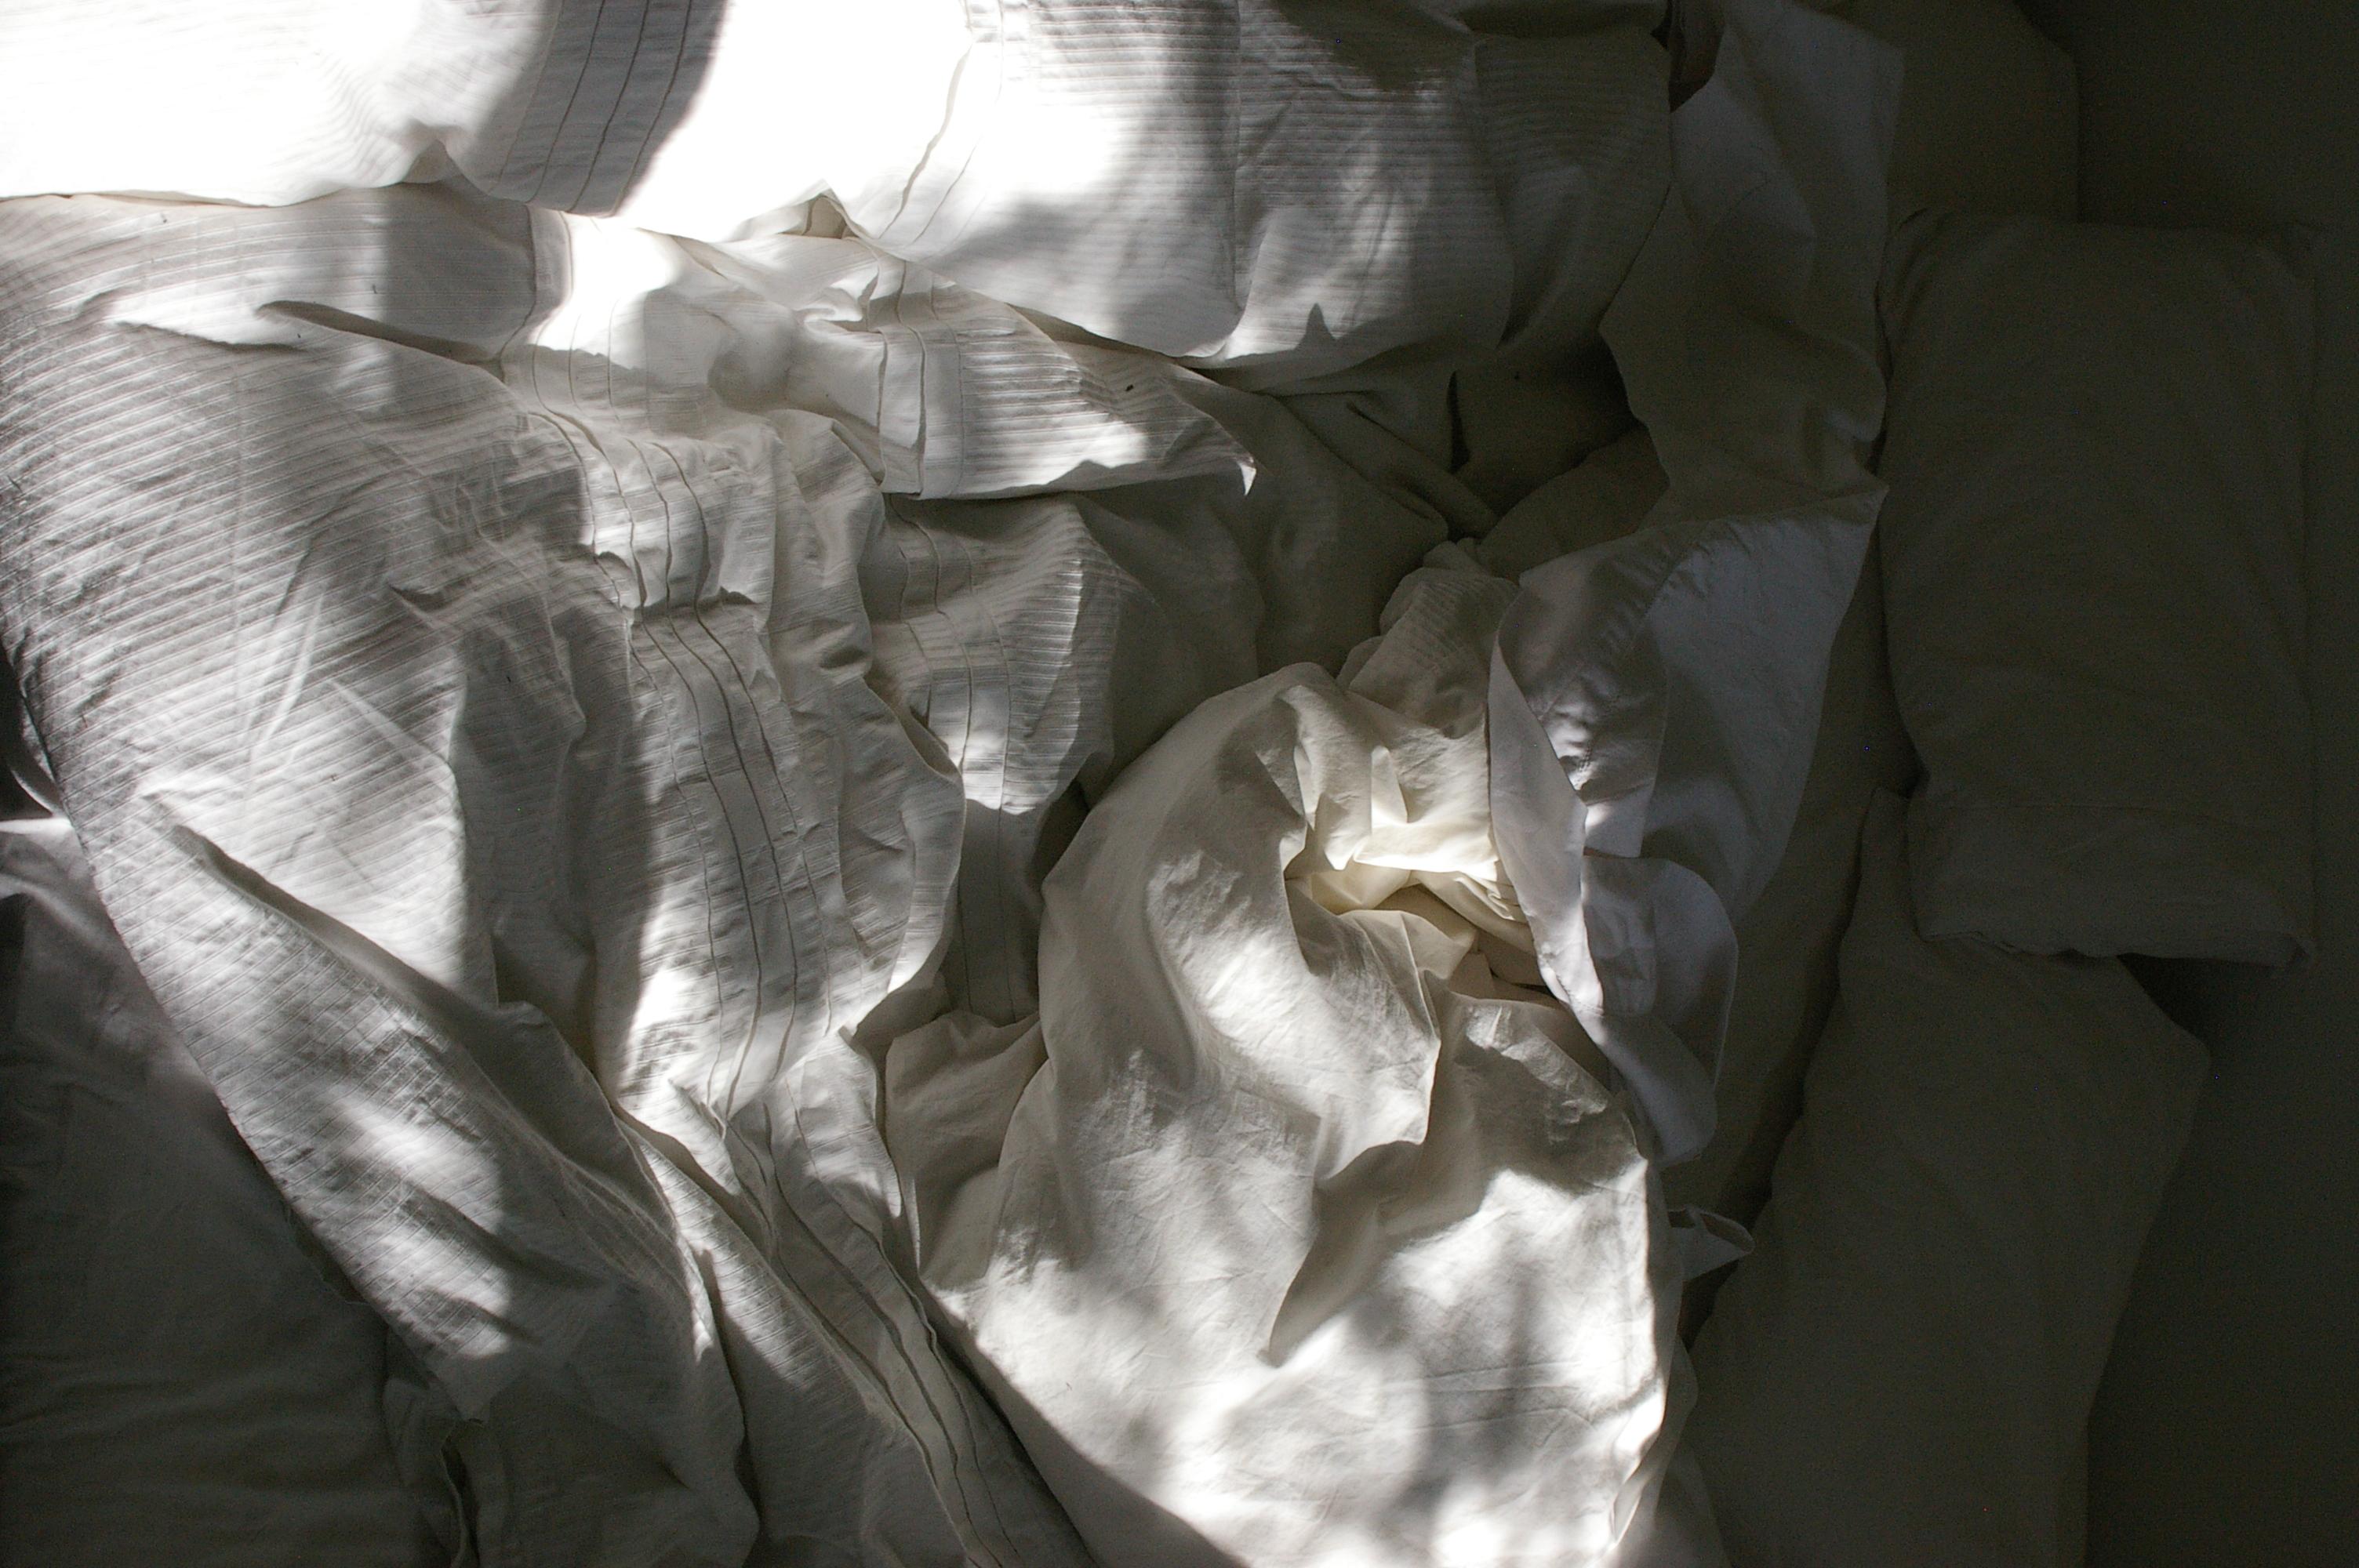 Bed _ _ _ Eliza Gower